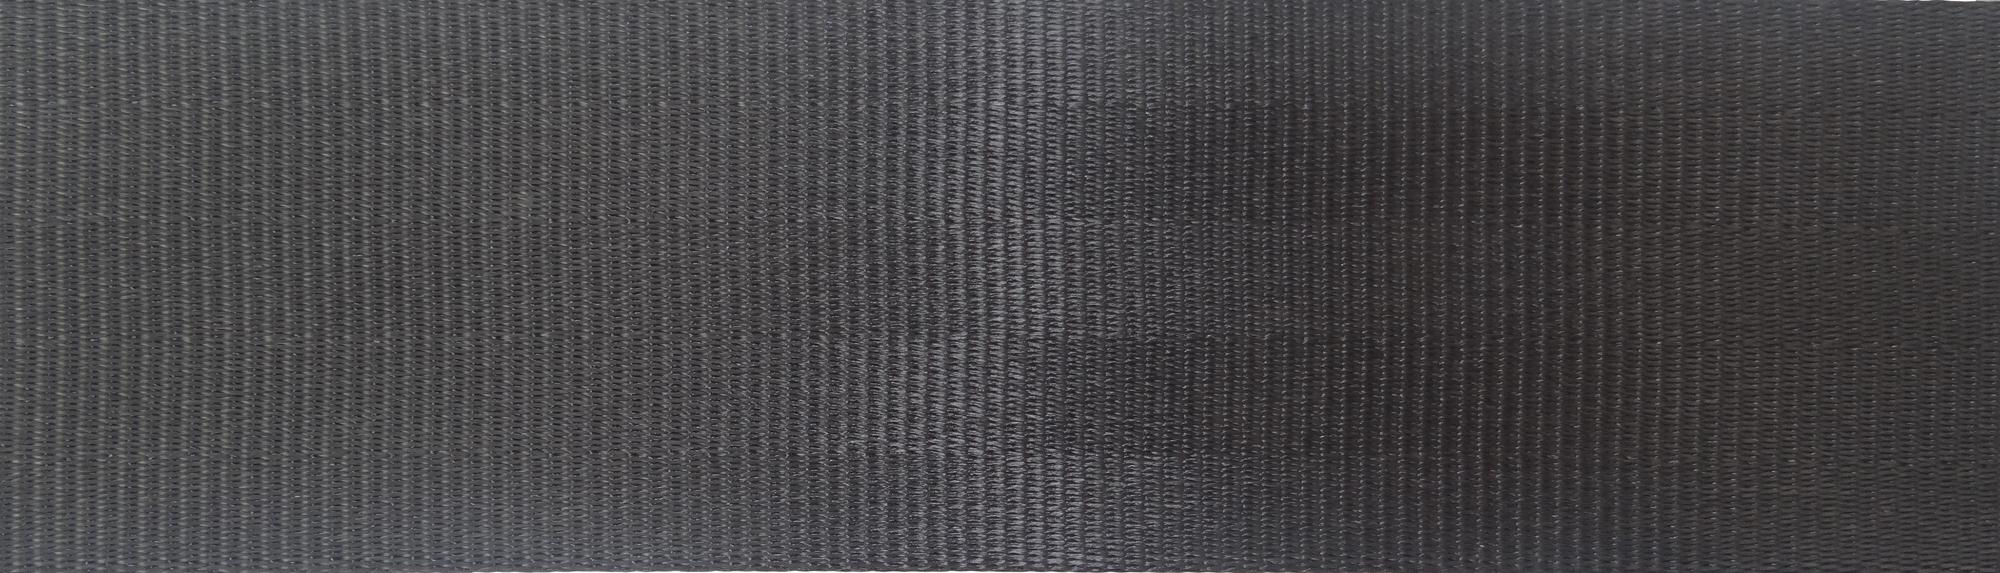 5 Panel Black (Ecotech)